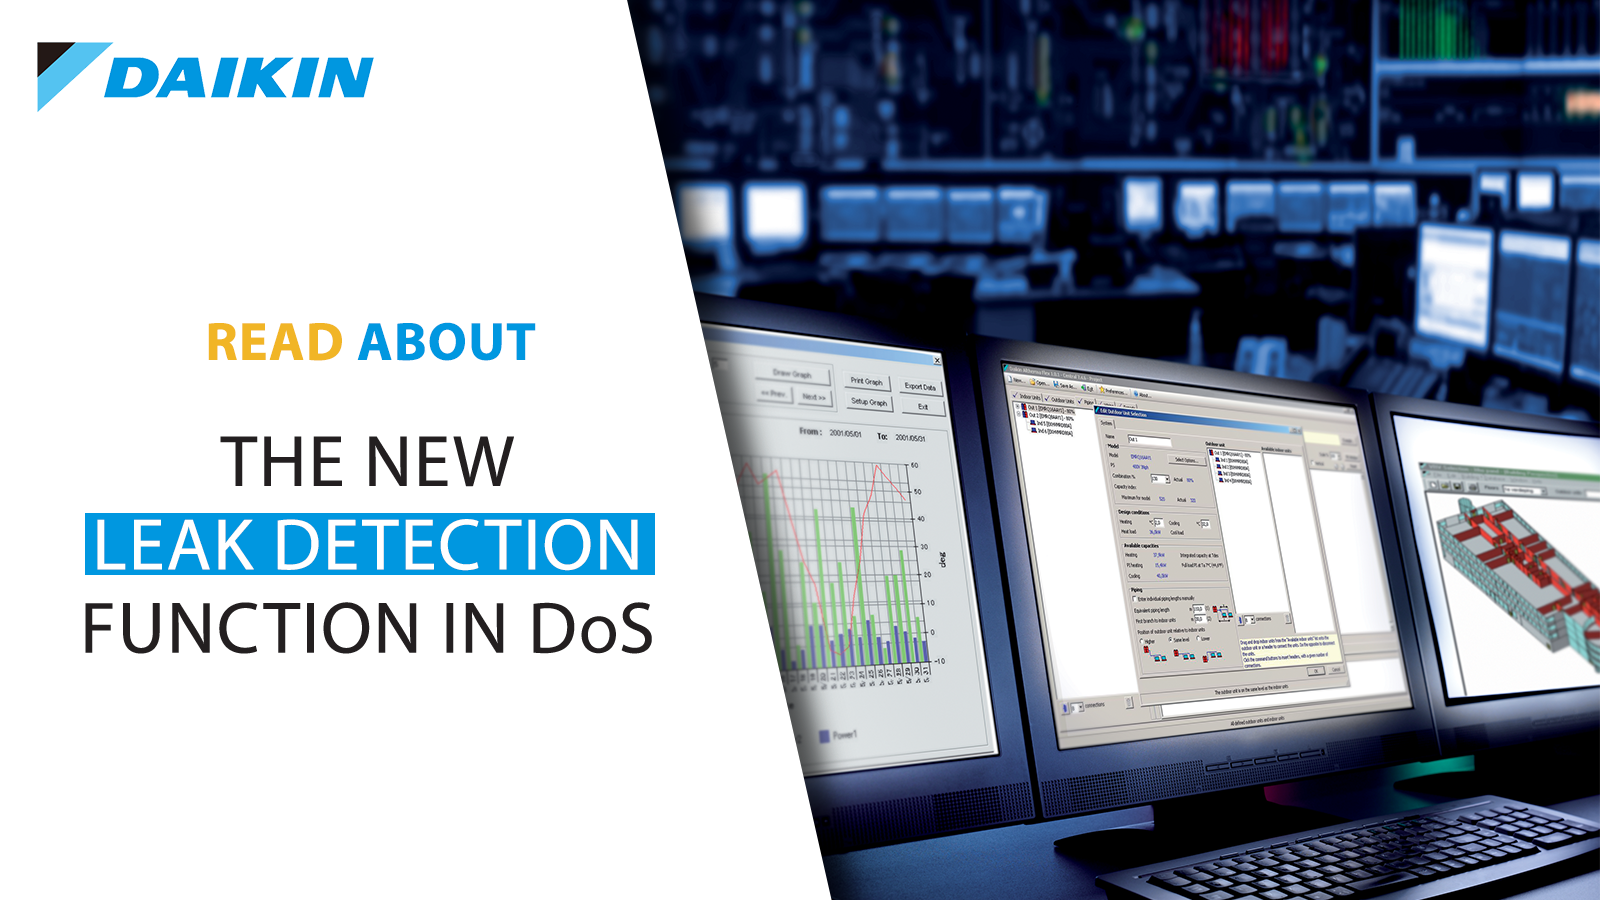 Daikin new Leak Detection function